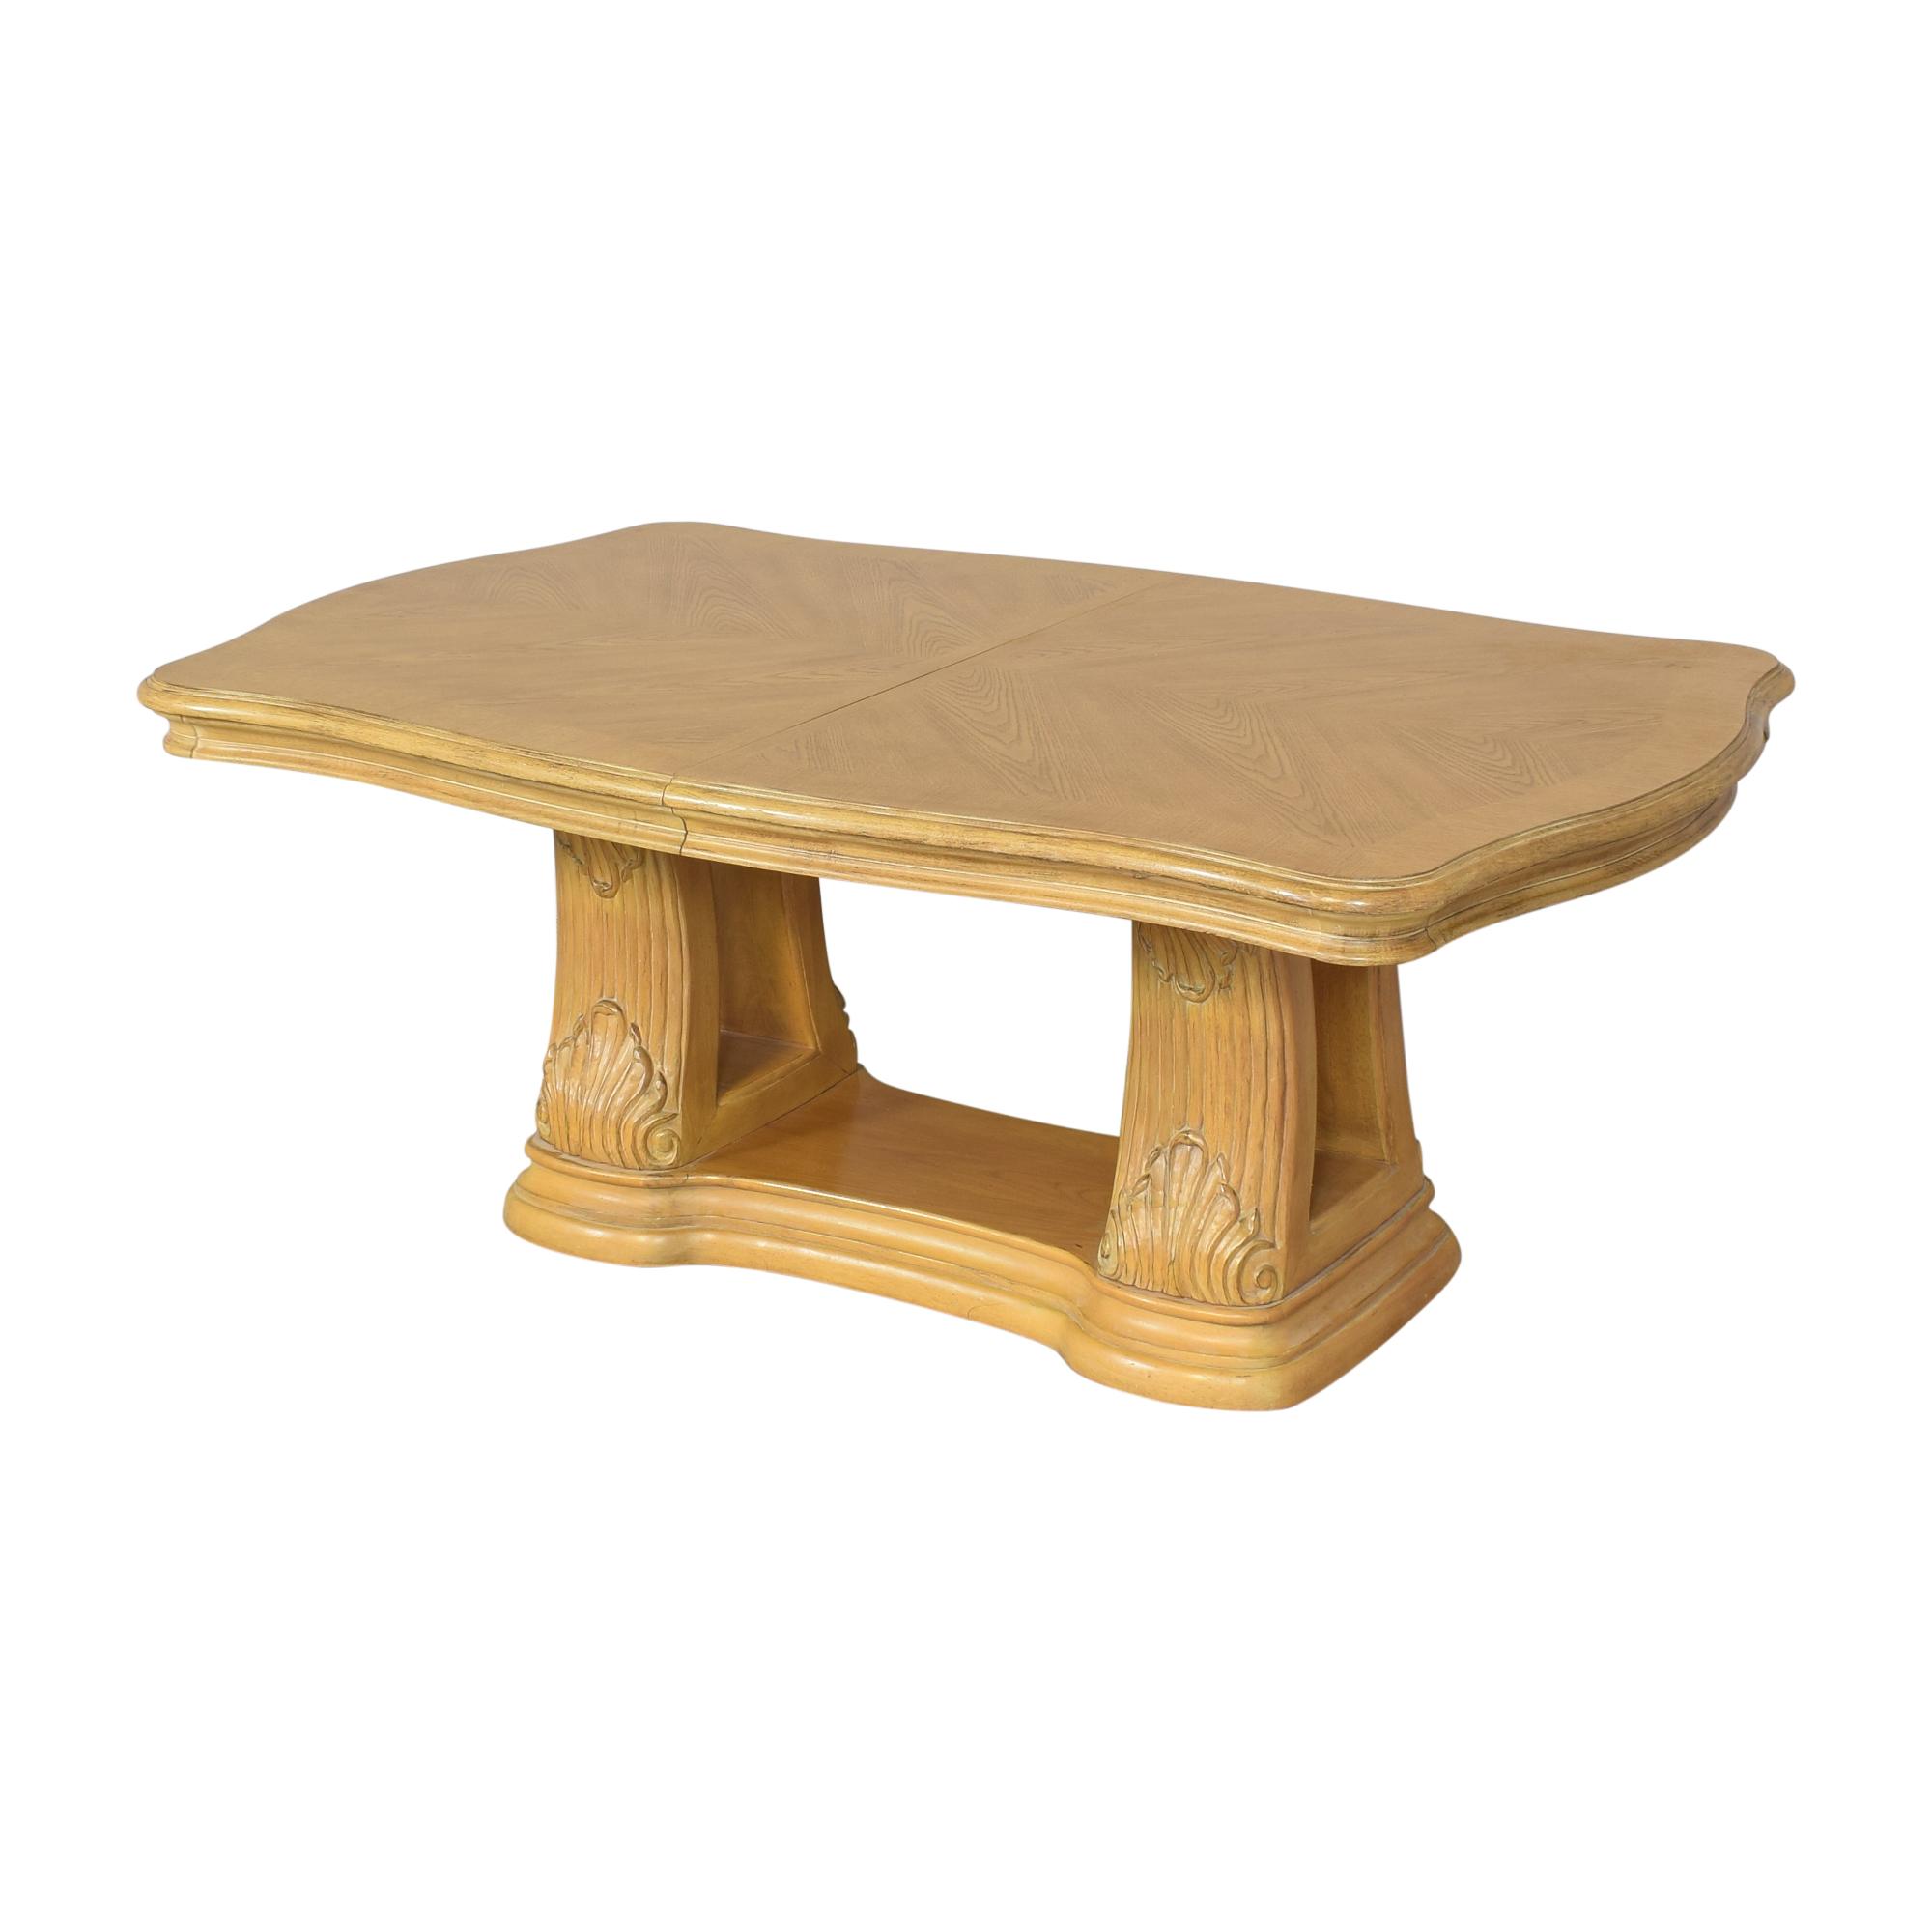 Bernhardt Bernhardt Extension Dining Table nyc